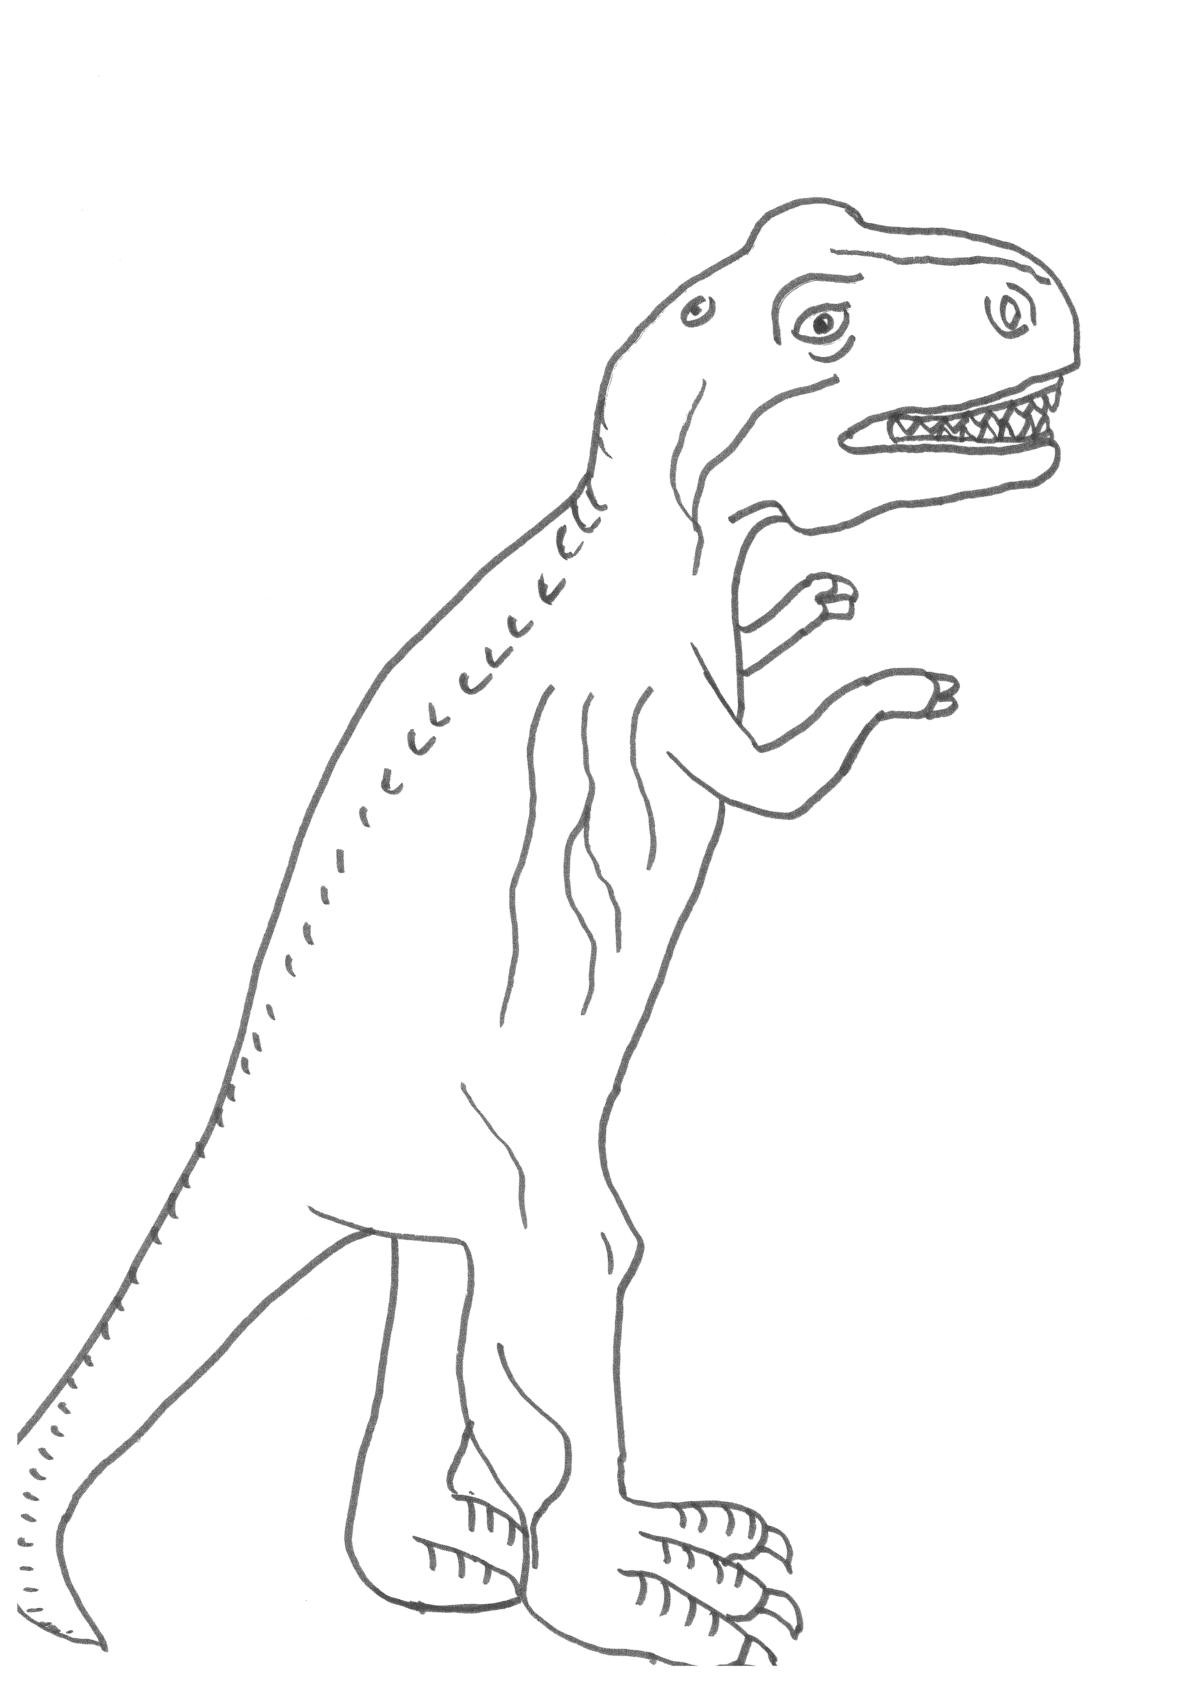 Dinosaurier Ausmalbilder Tyrannosaurus Rex Neu Tyrannosaurus Rex Bilder Zum Ausdrucken — Hylenddawards Stock